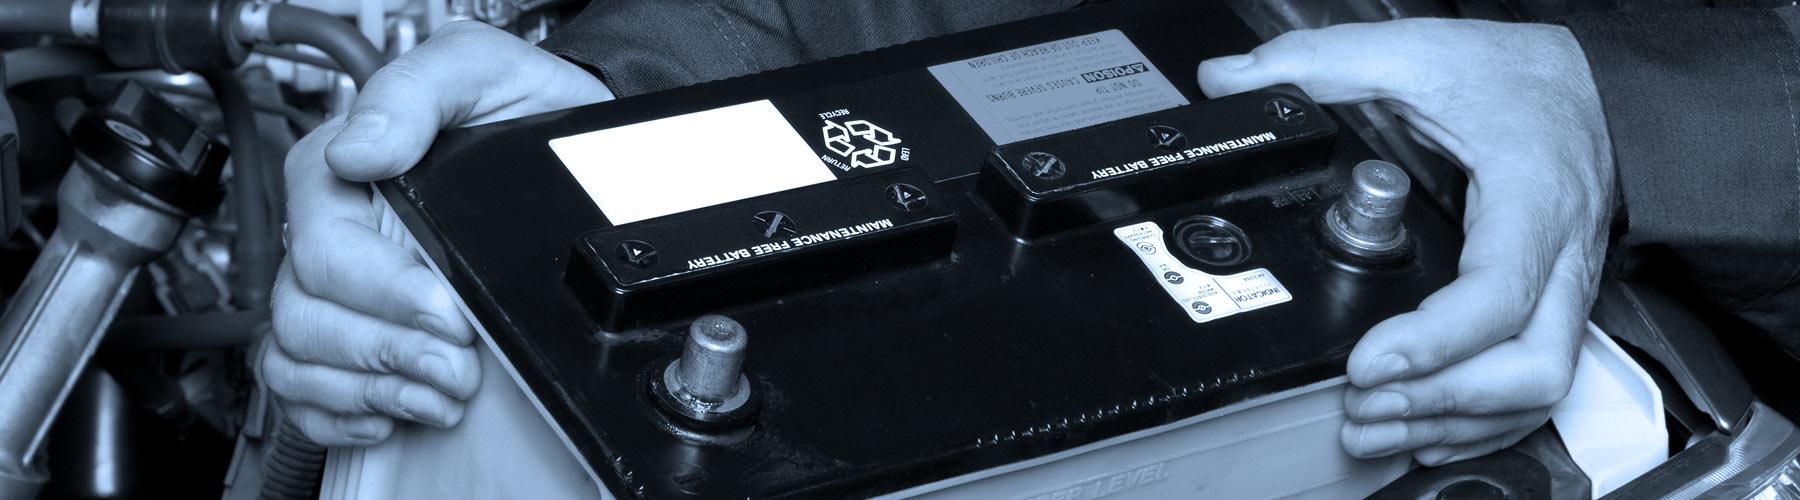 Mike Murphy Home Automotive Fuse Box Nz Batteries